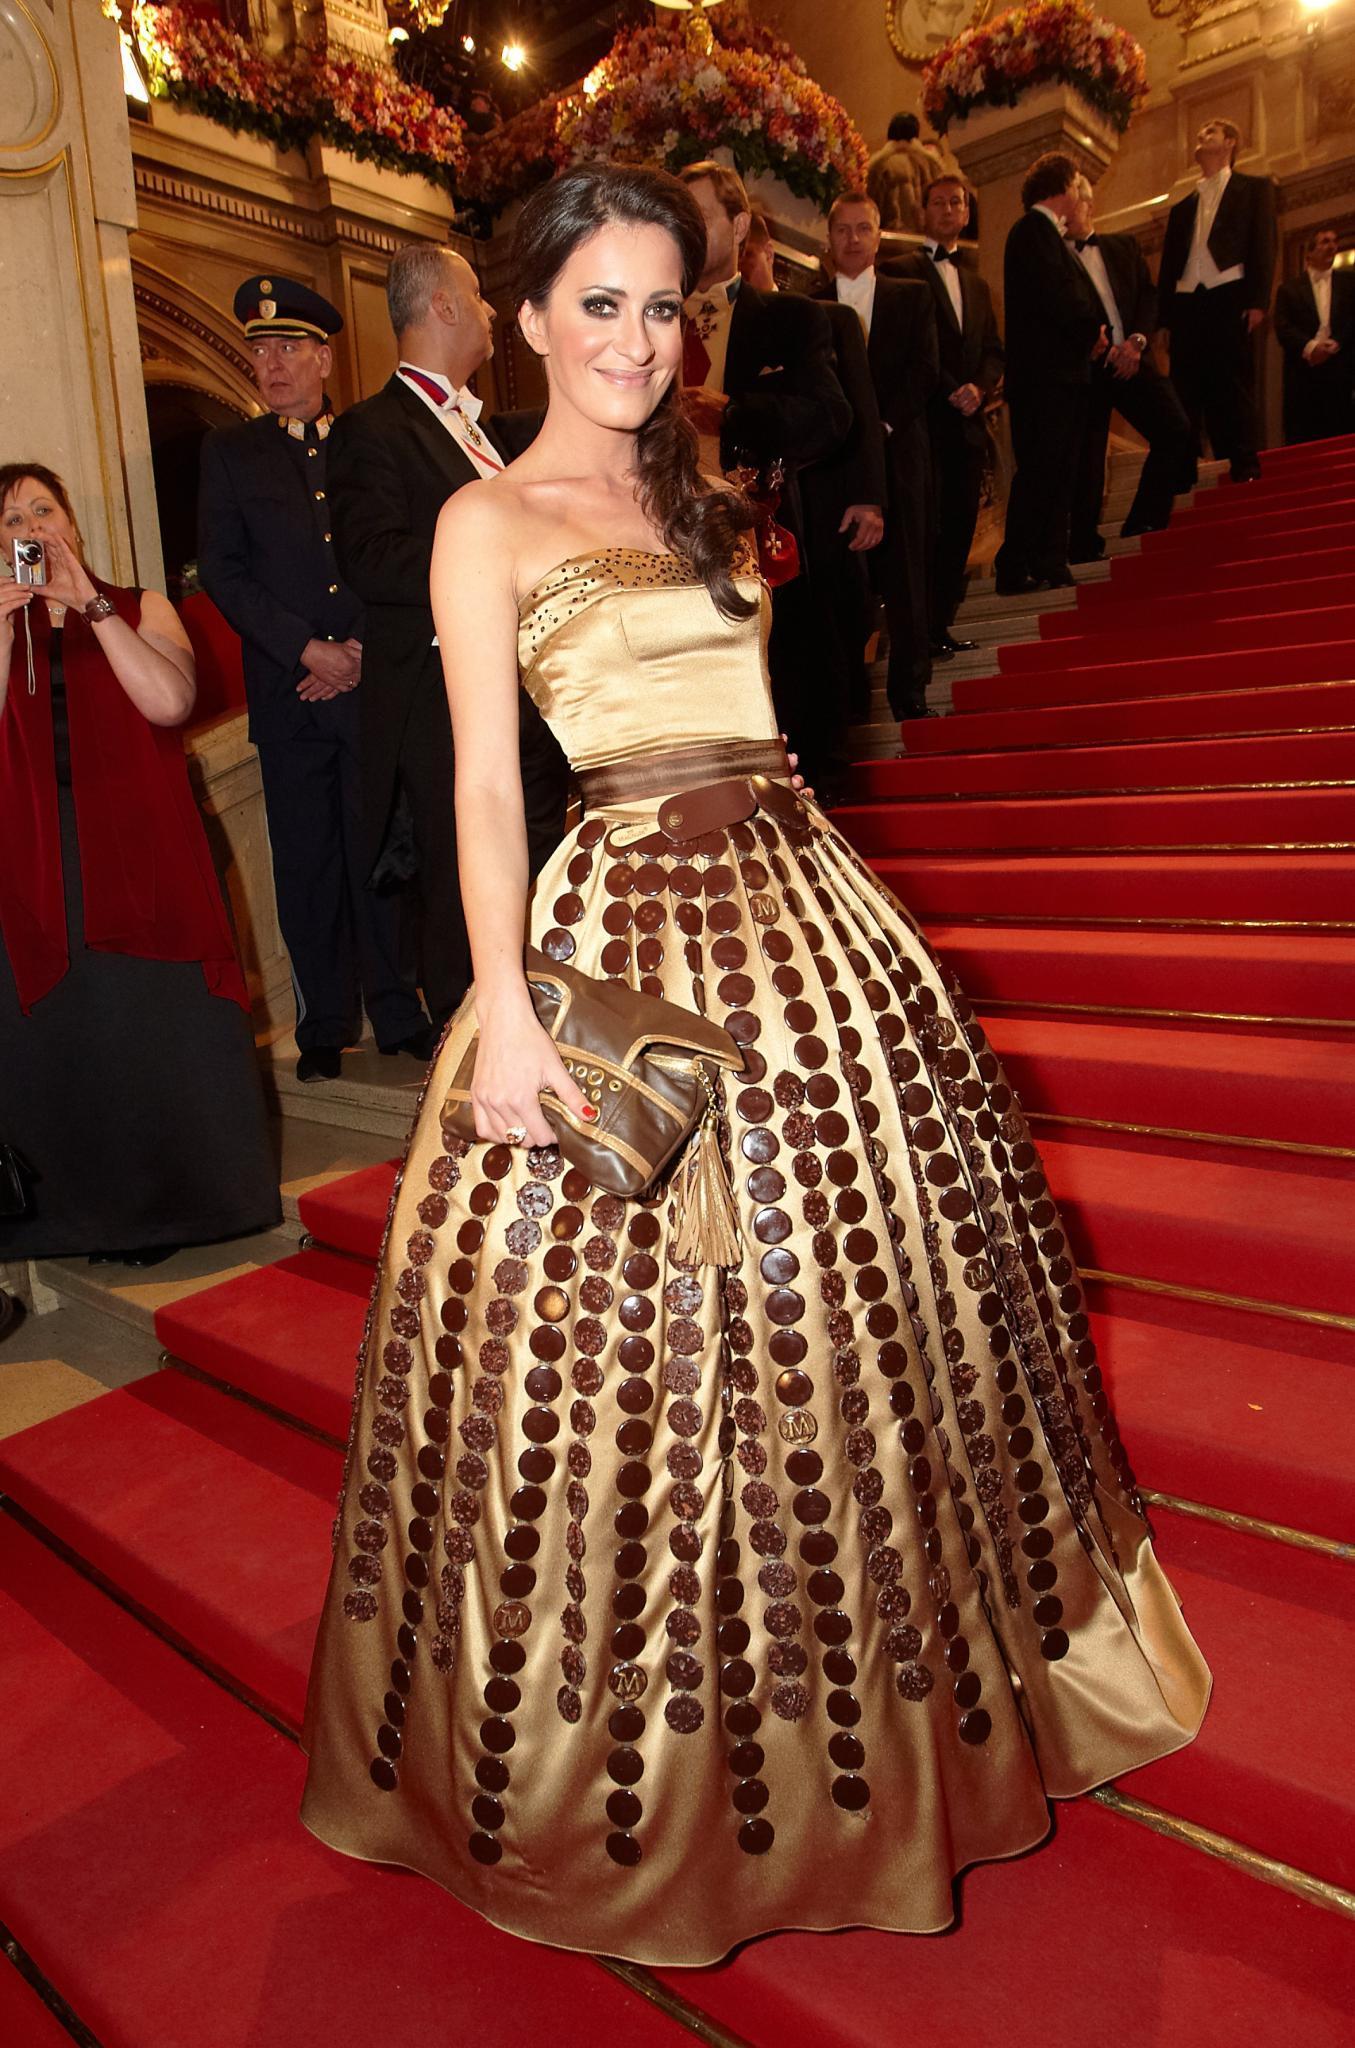 Klaas Heufer Umlaufs Freundin Doris Golpashin beim Wiener Opernball 2012.